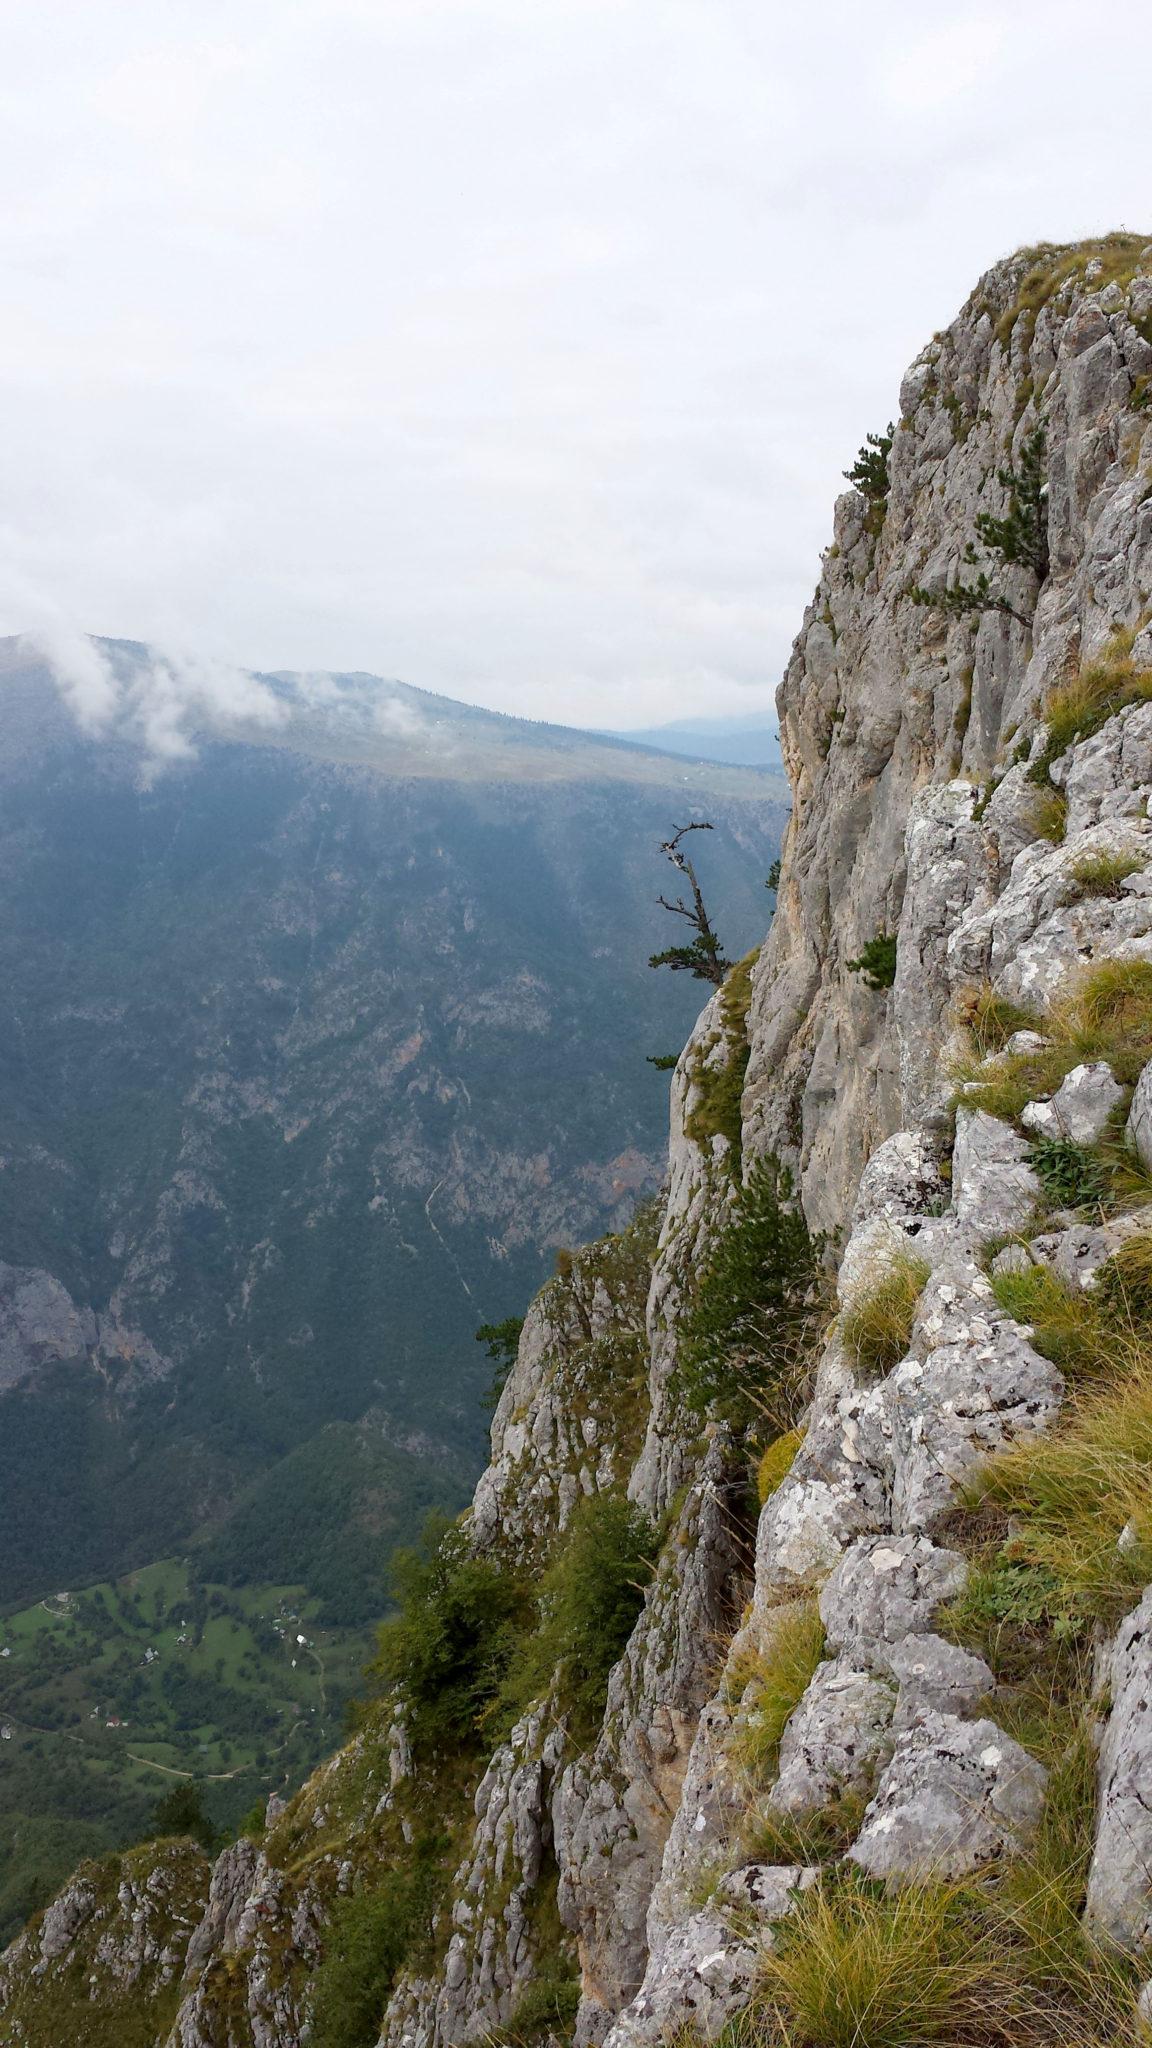 Hemaposesesvalises_montenegro_la_randonnee_champignon_voyage_travel_blog4